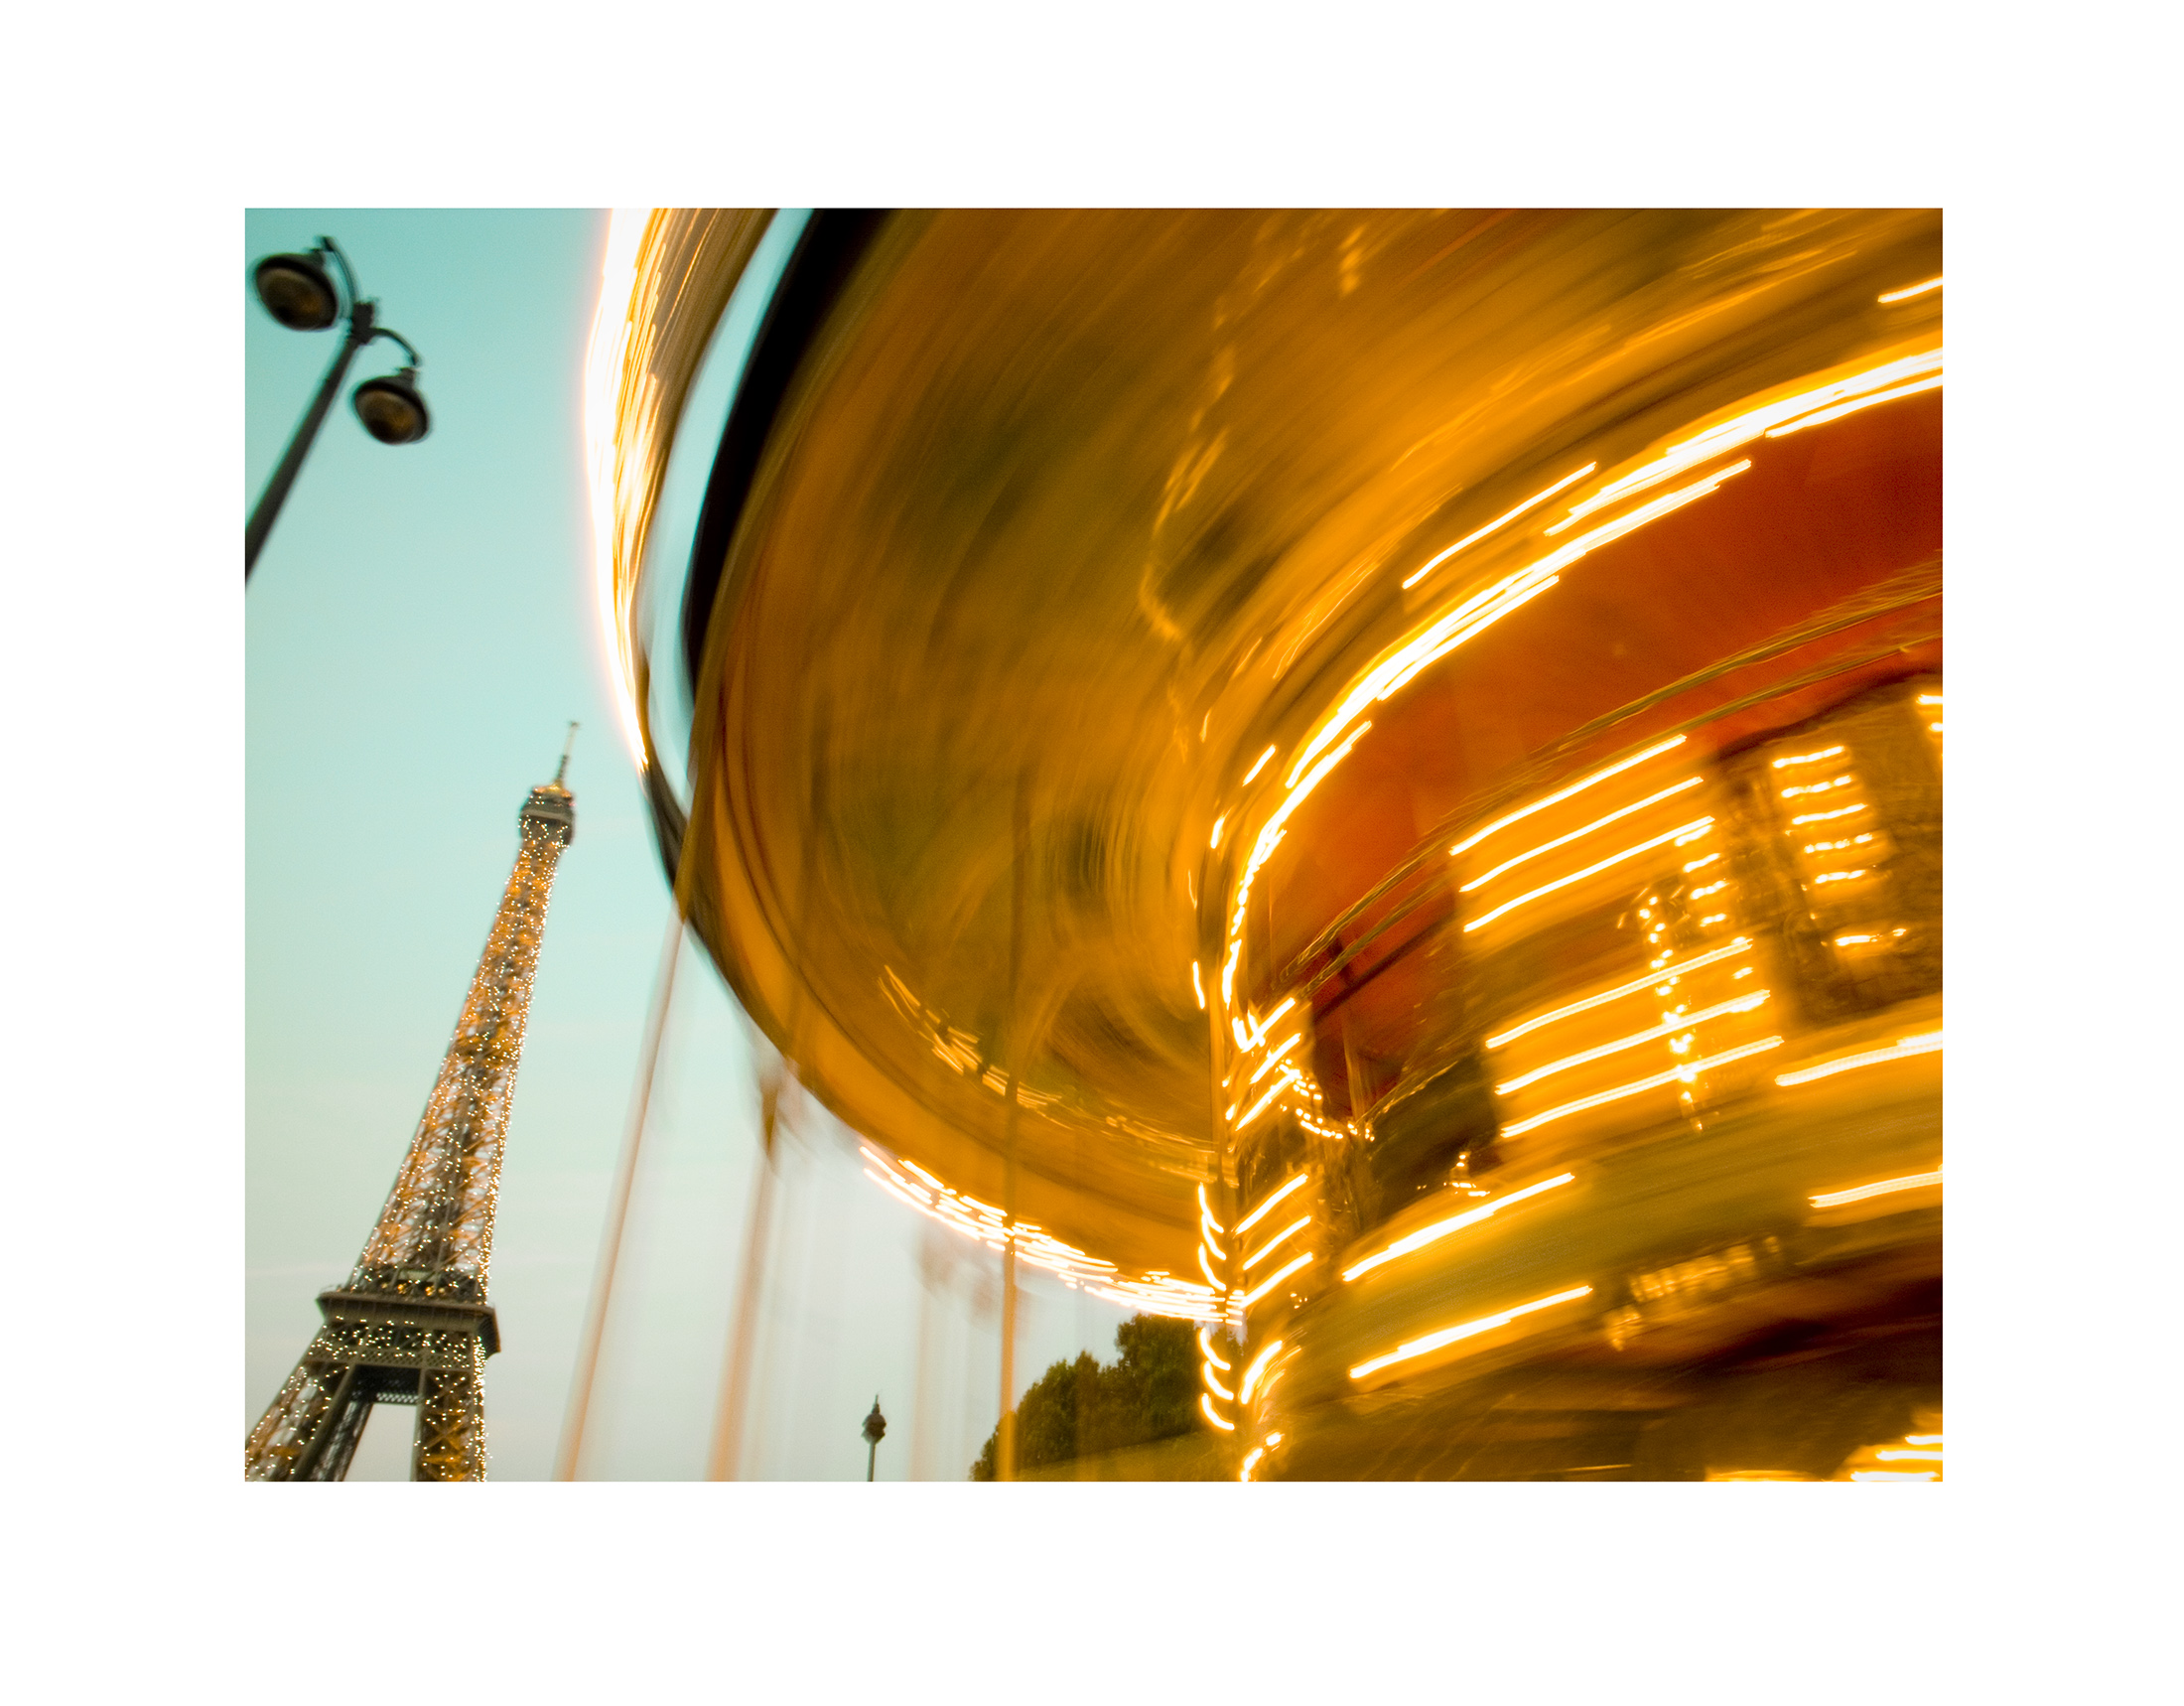 Paris_0011572.jpg